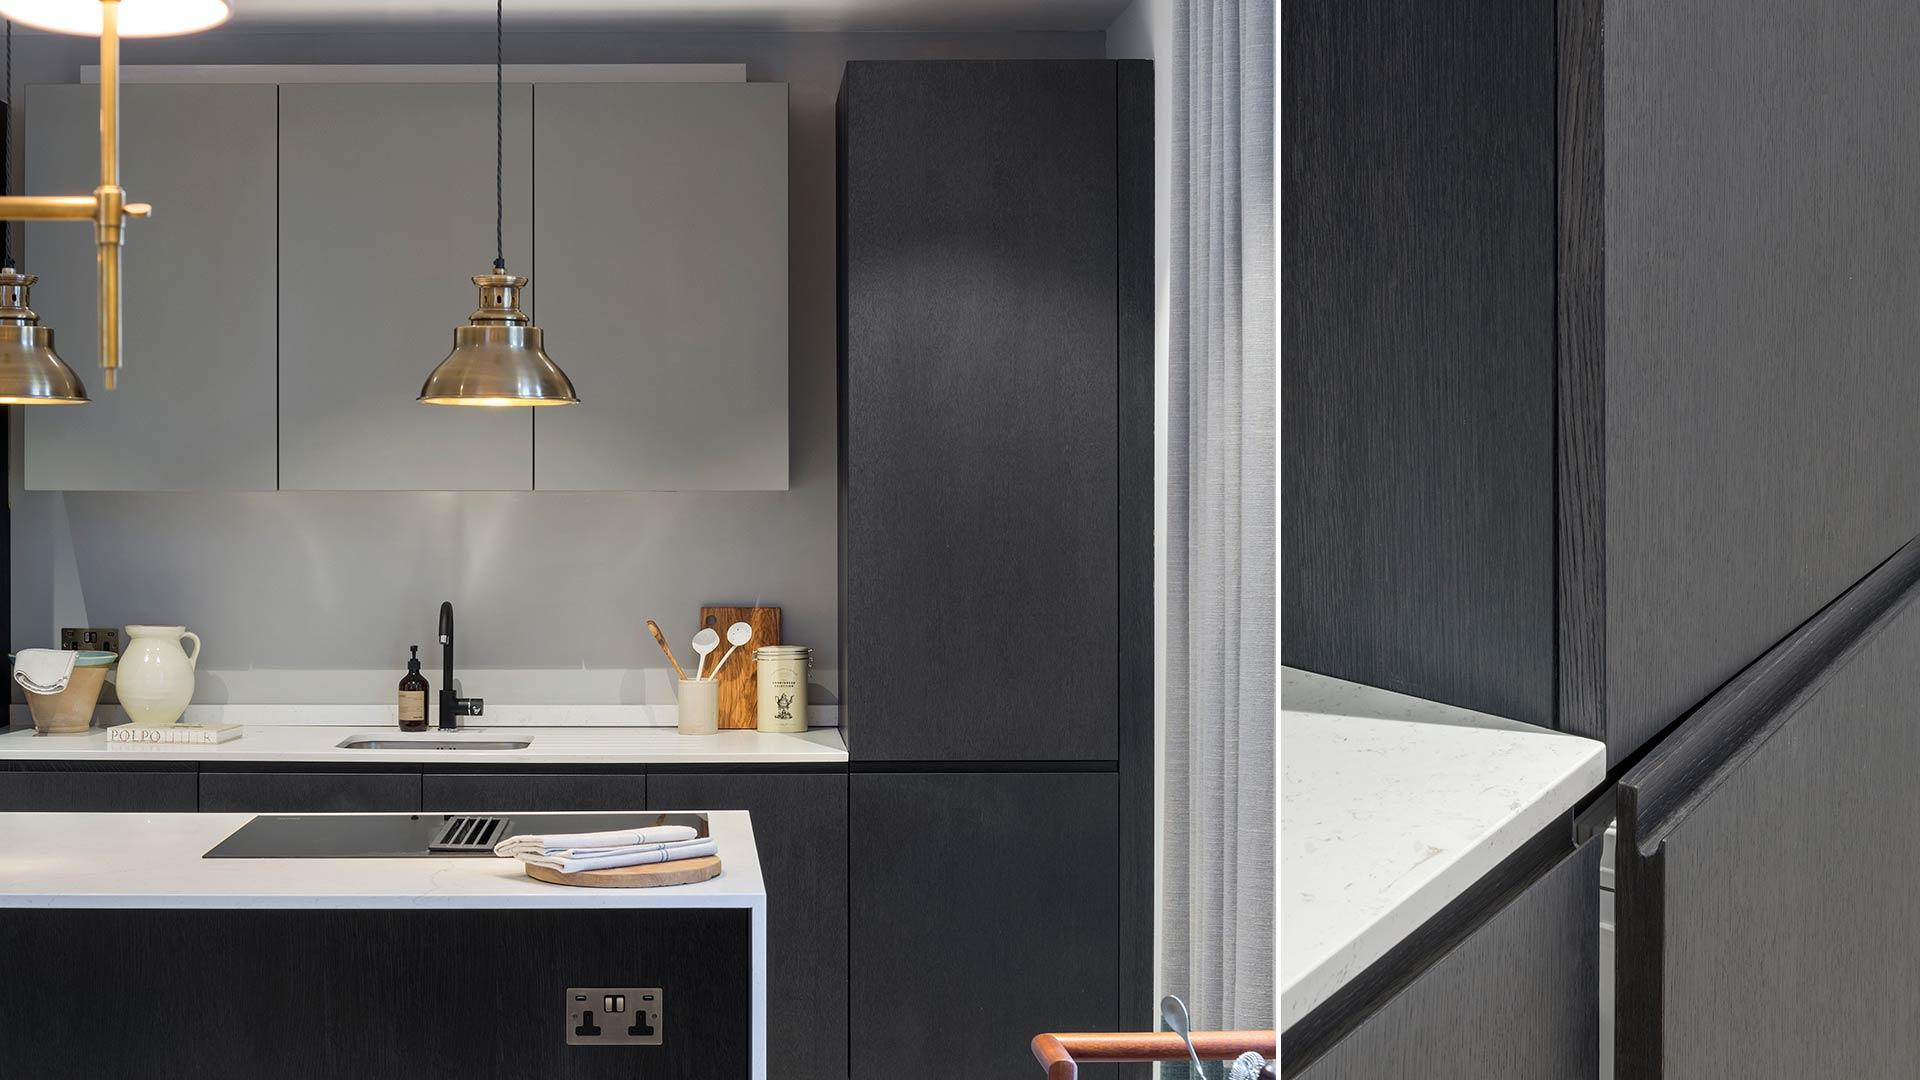 kitchens with islandkitchens with island_london 4